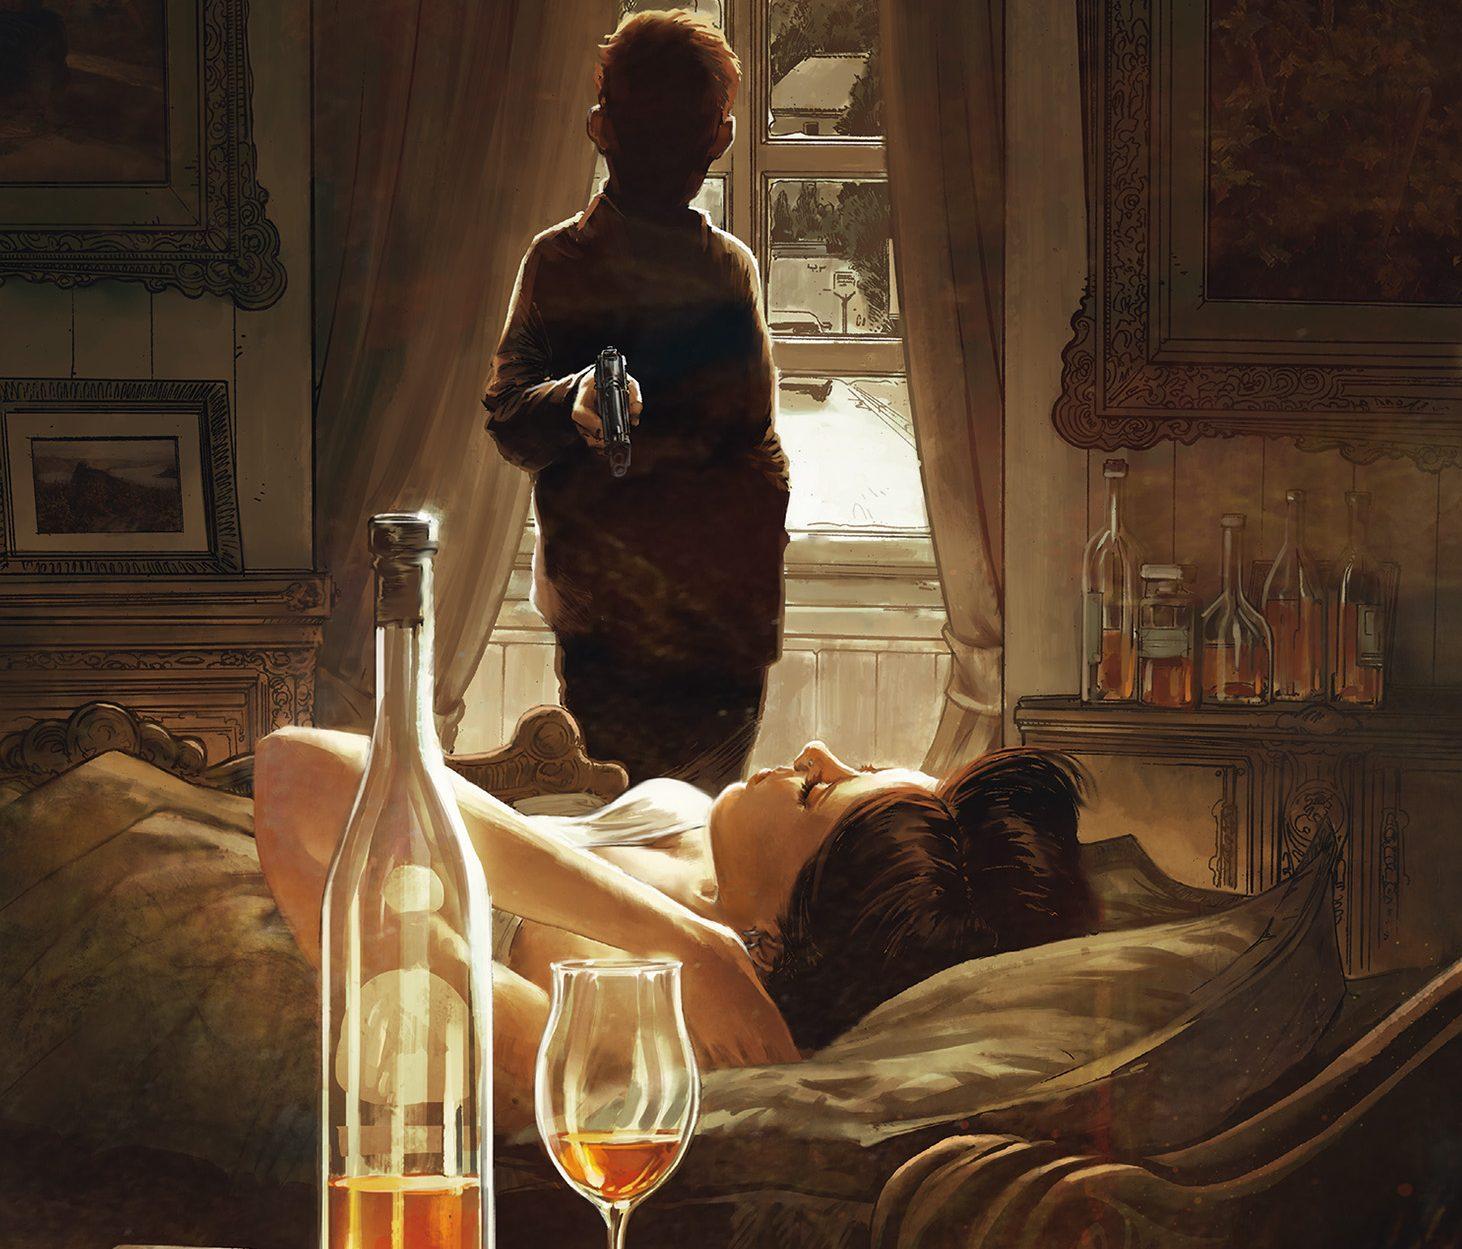 On a lu Cognac (T2. Un mort dans l'arène) de Chapuzet, Corbeyran, Brahy